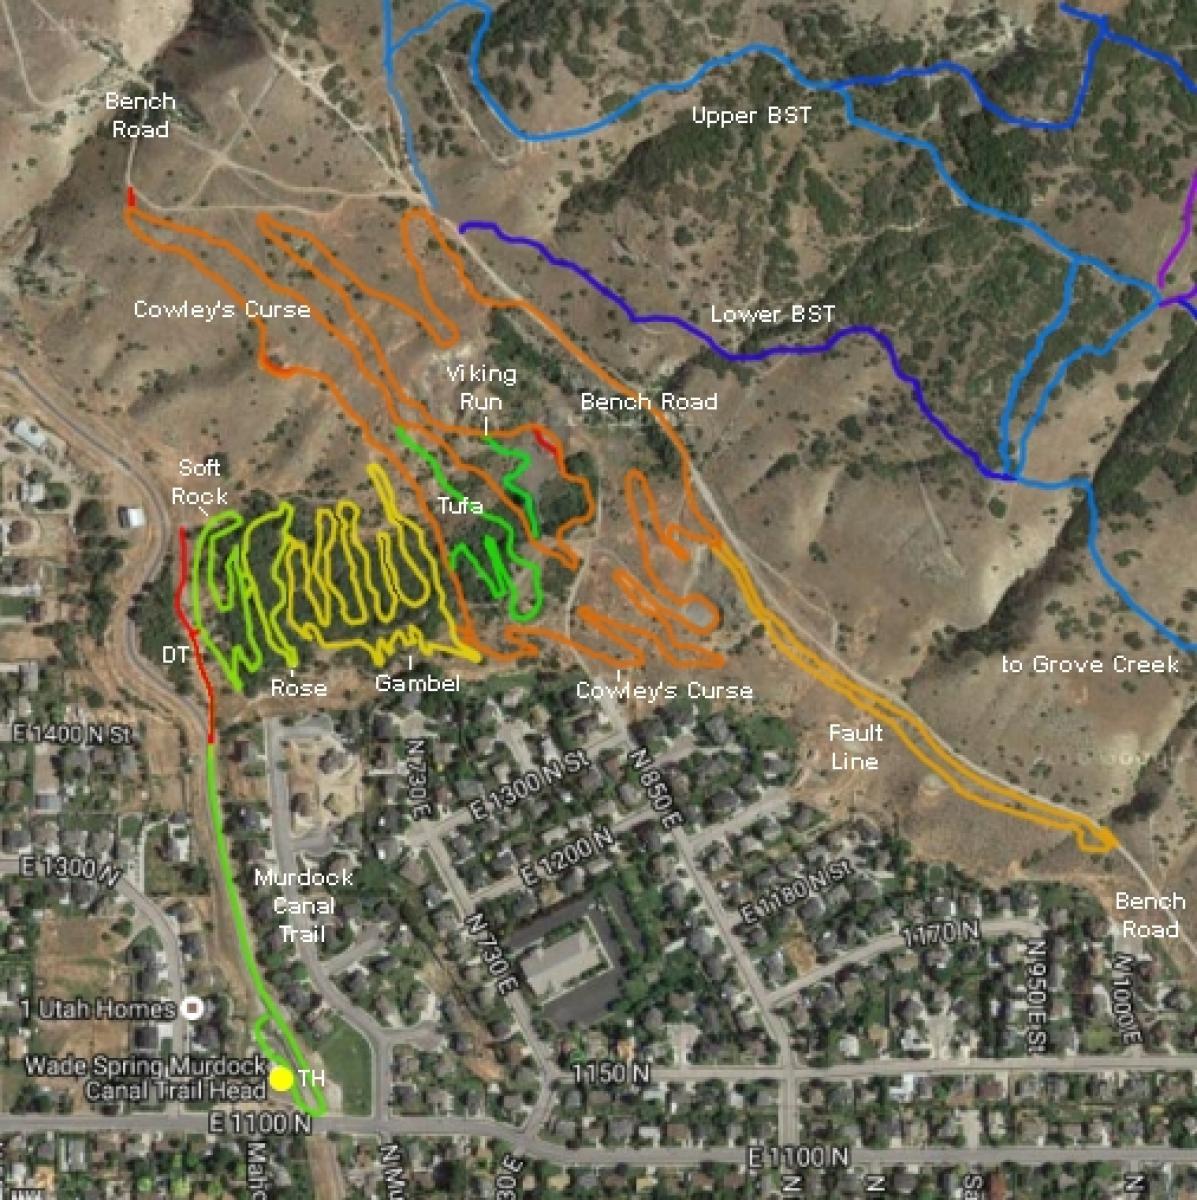 Valley Vista Trail System